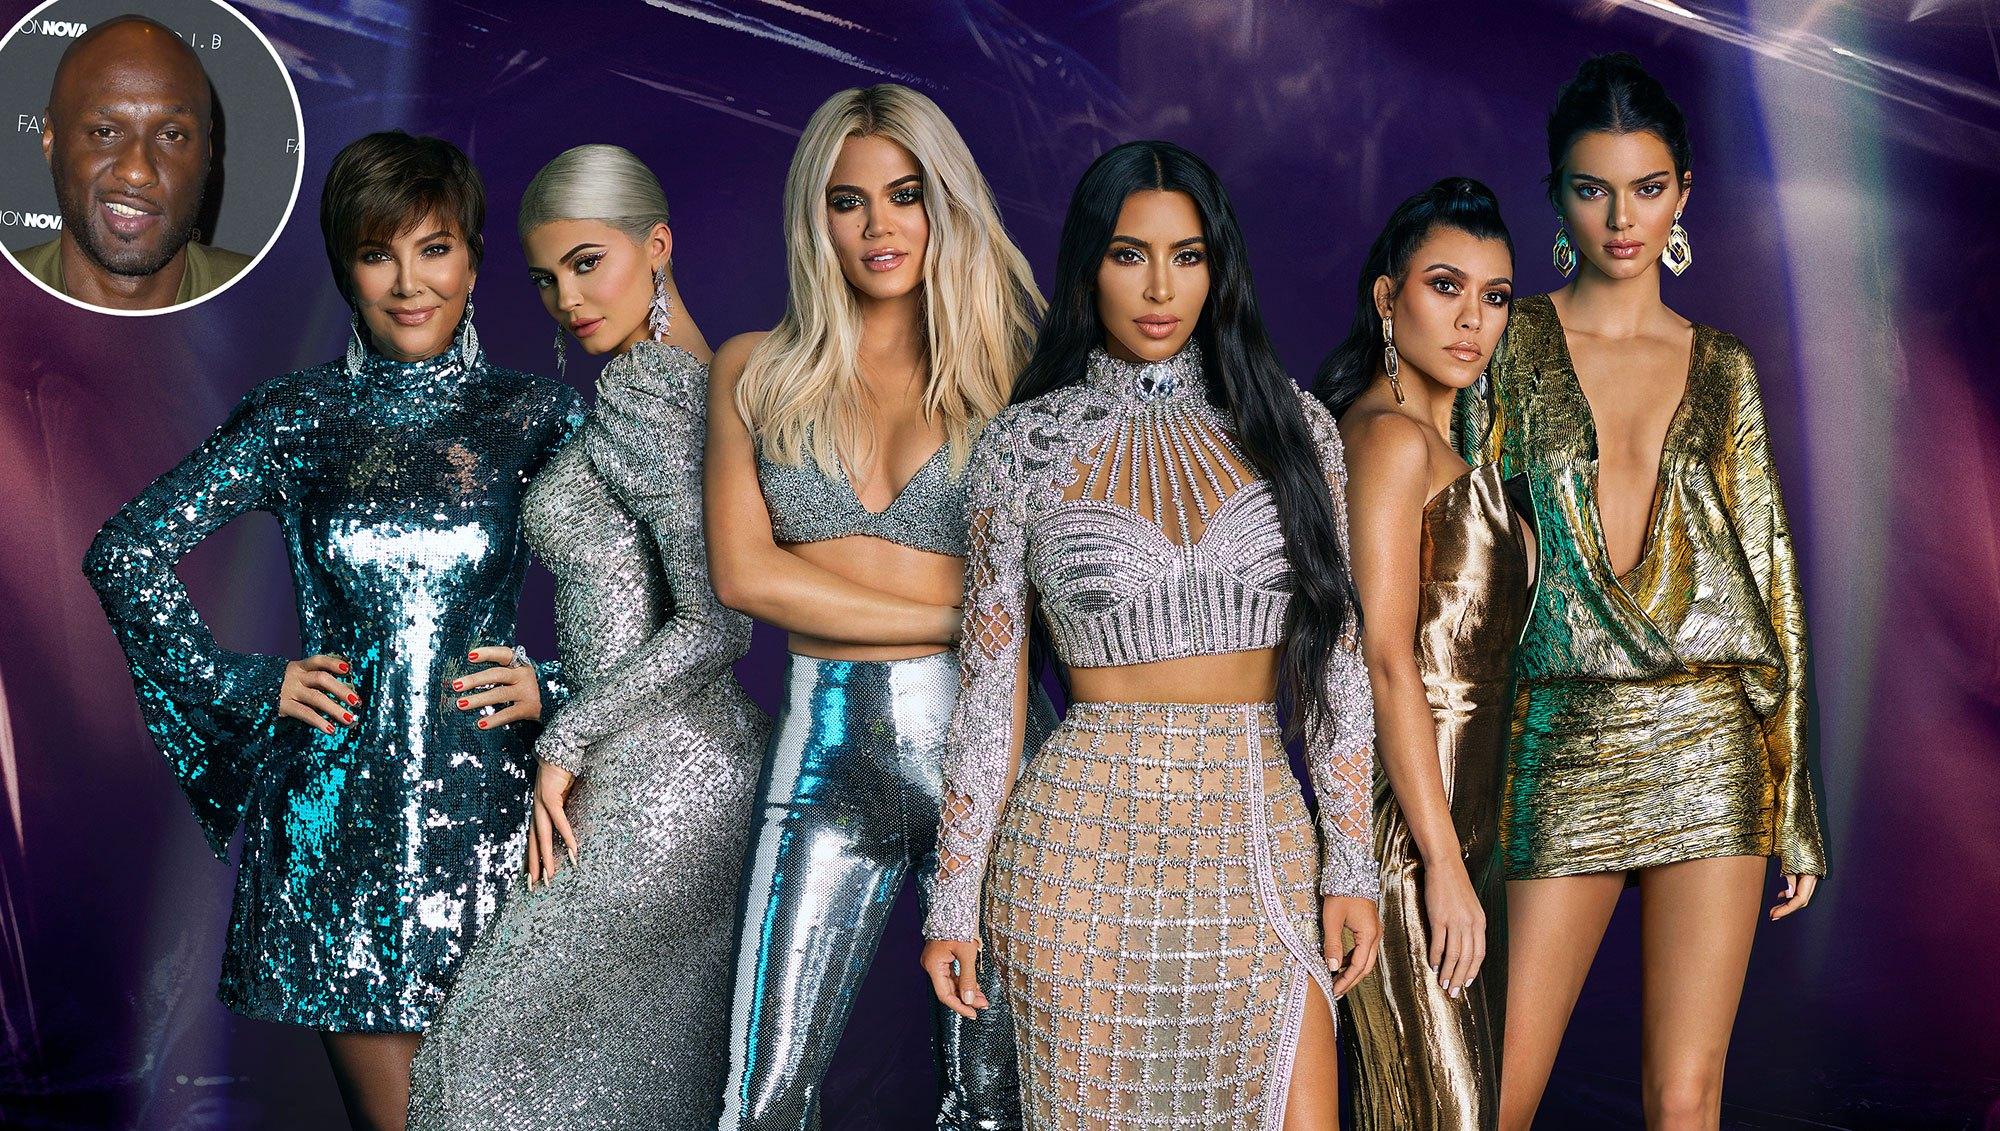 Kardashians Not Worried About Lamar Odom Book